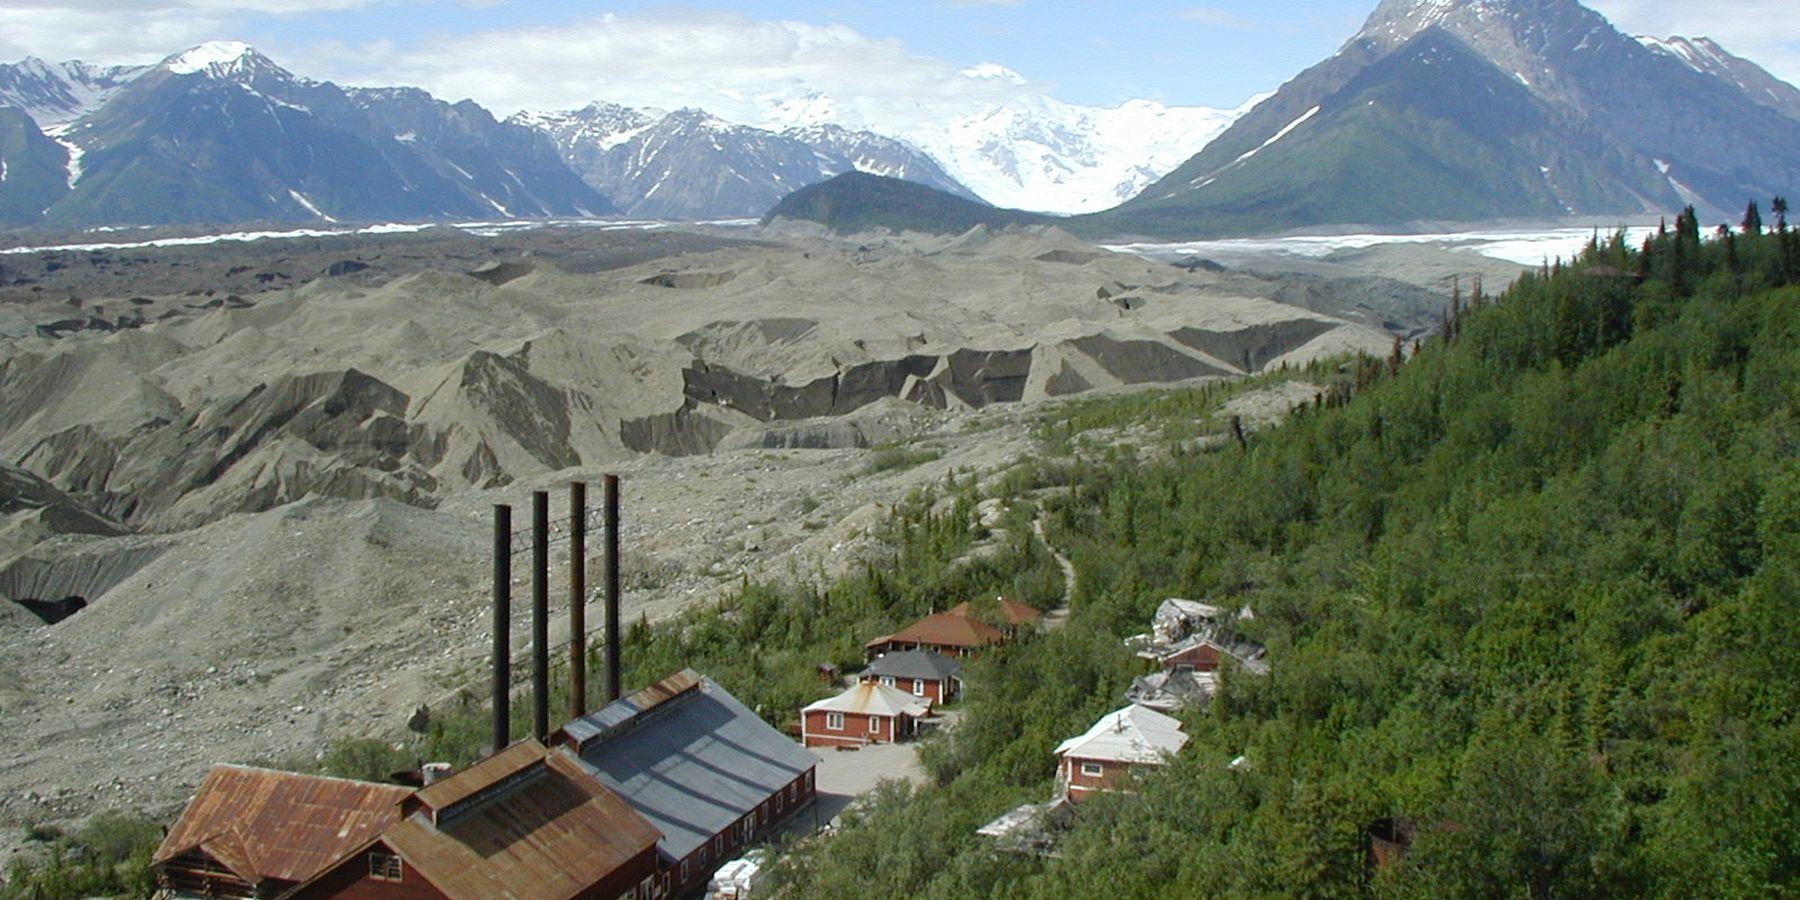 Wrangell St. Elias National Park - Kennicott - Alaska - Doets Reizen